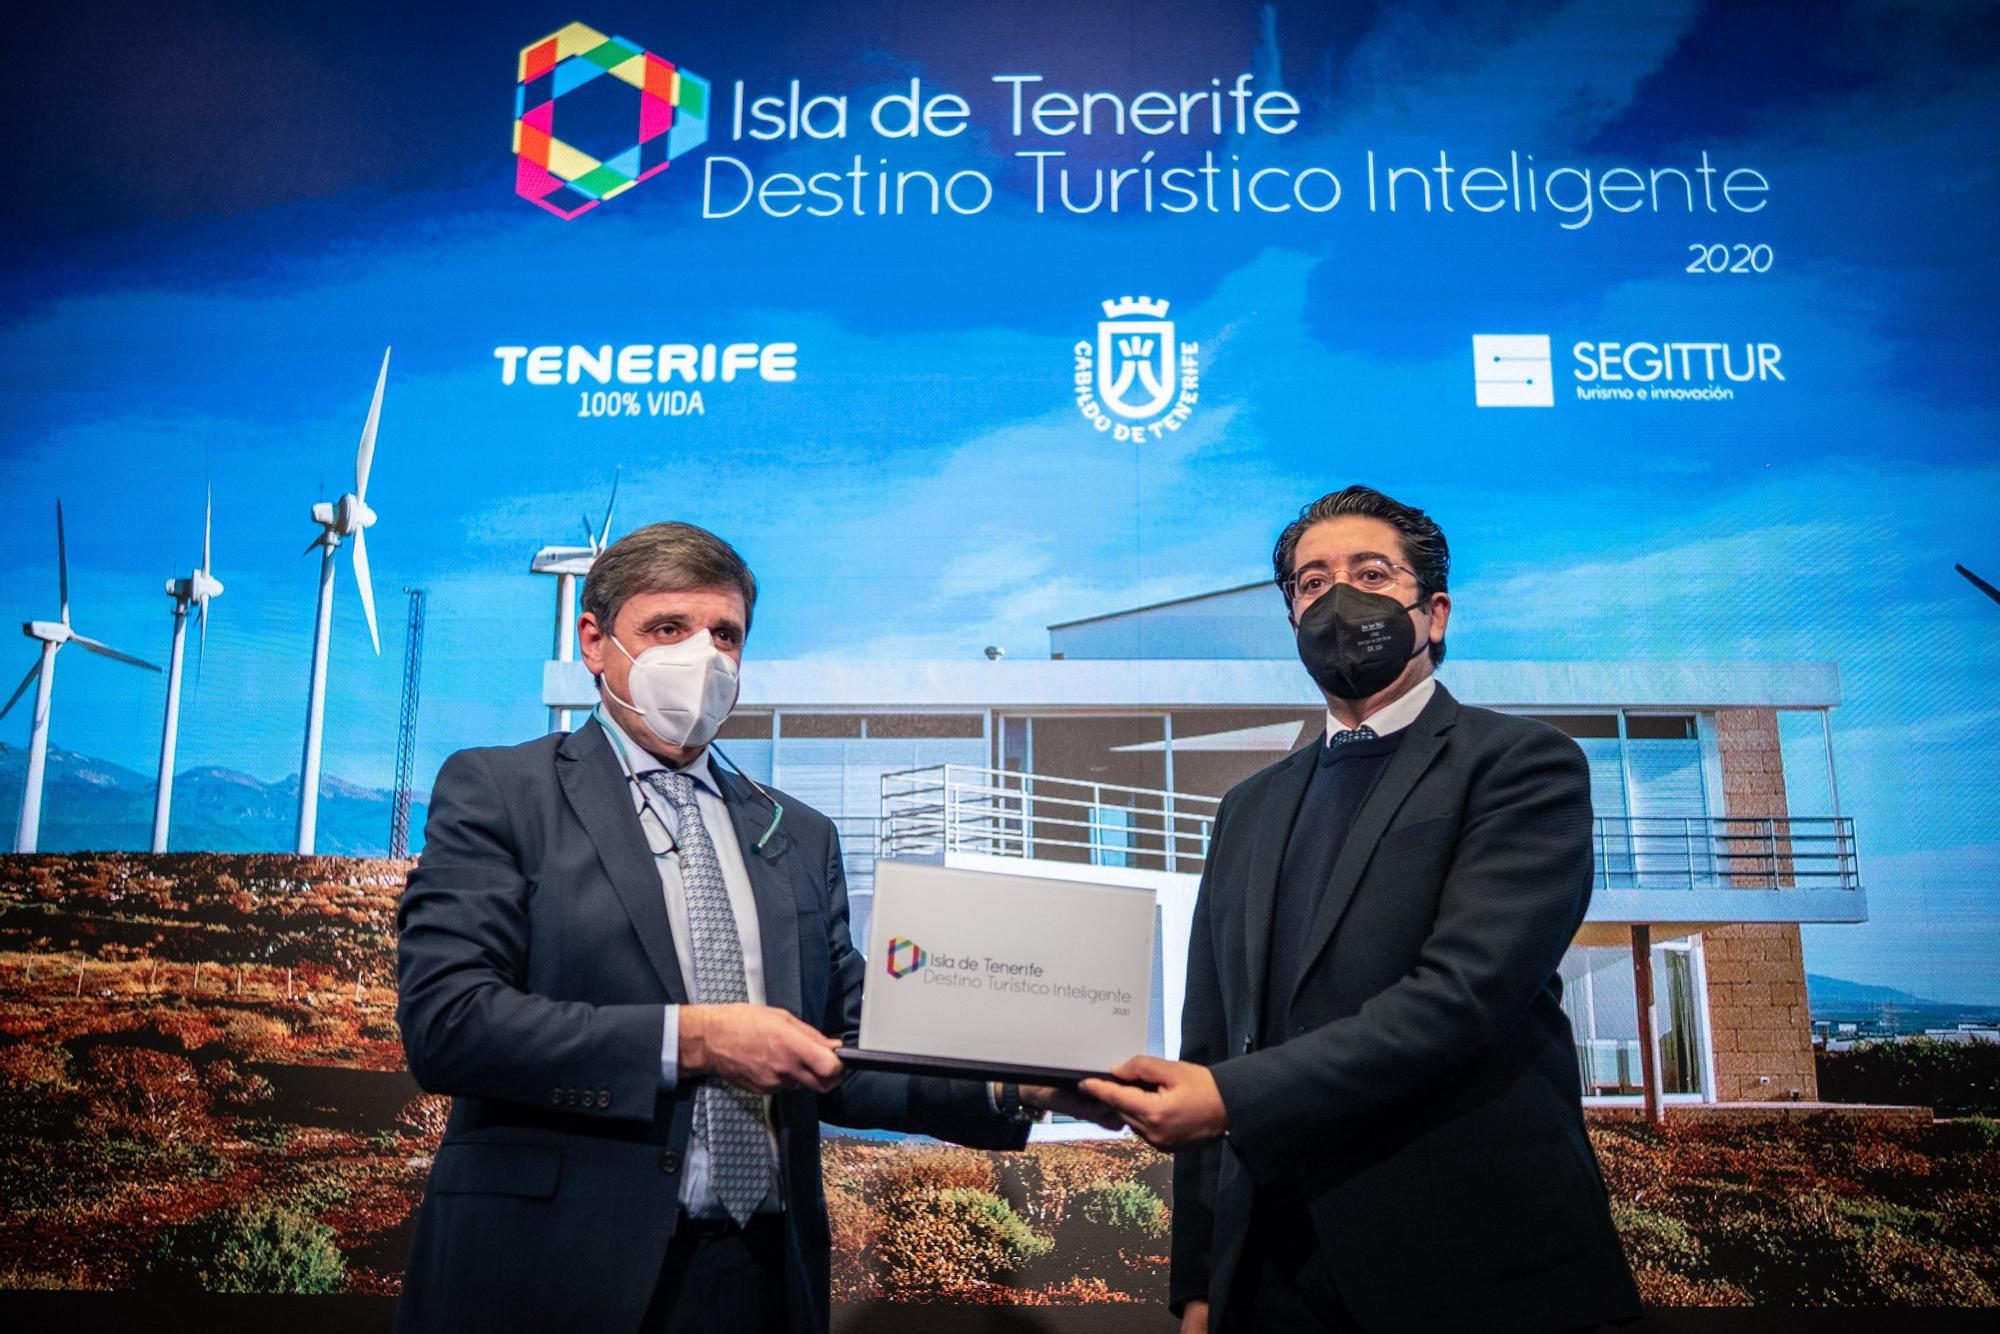 Tenerife, primera isla española que se convierte en Destino Turístico Inteligente